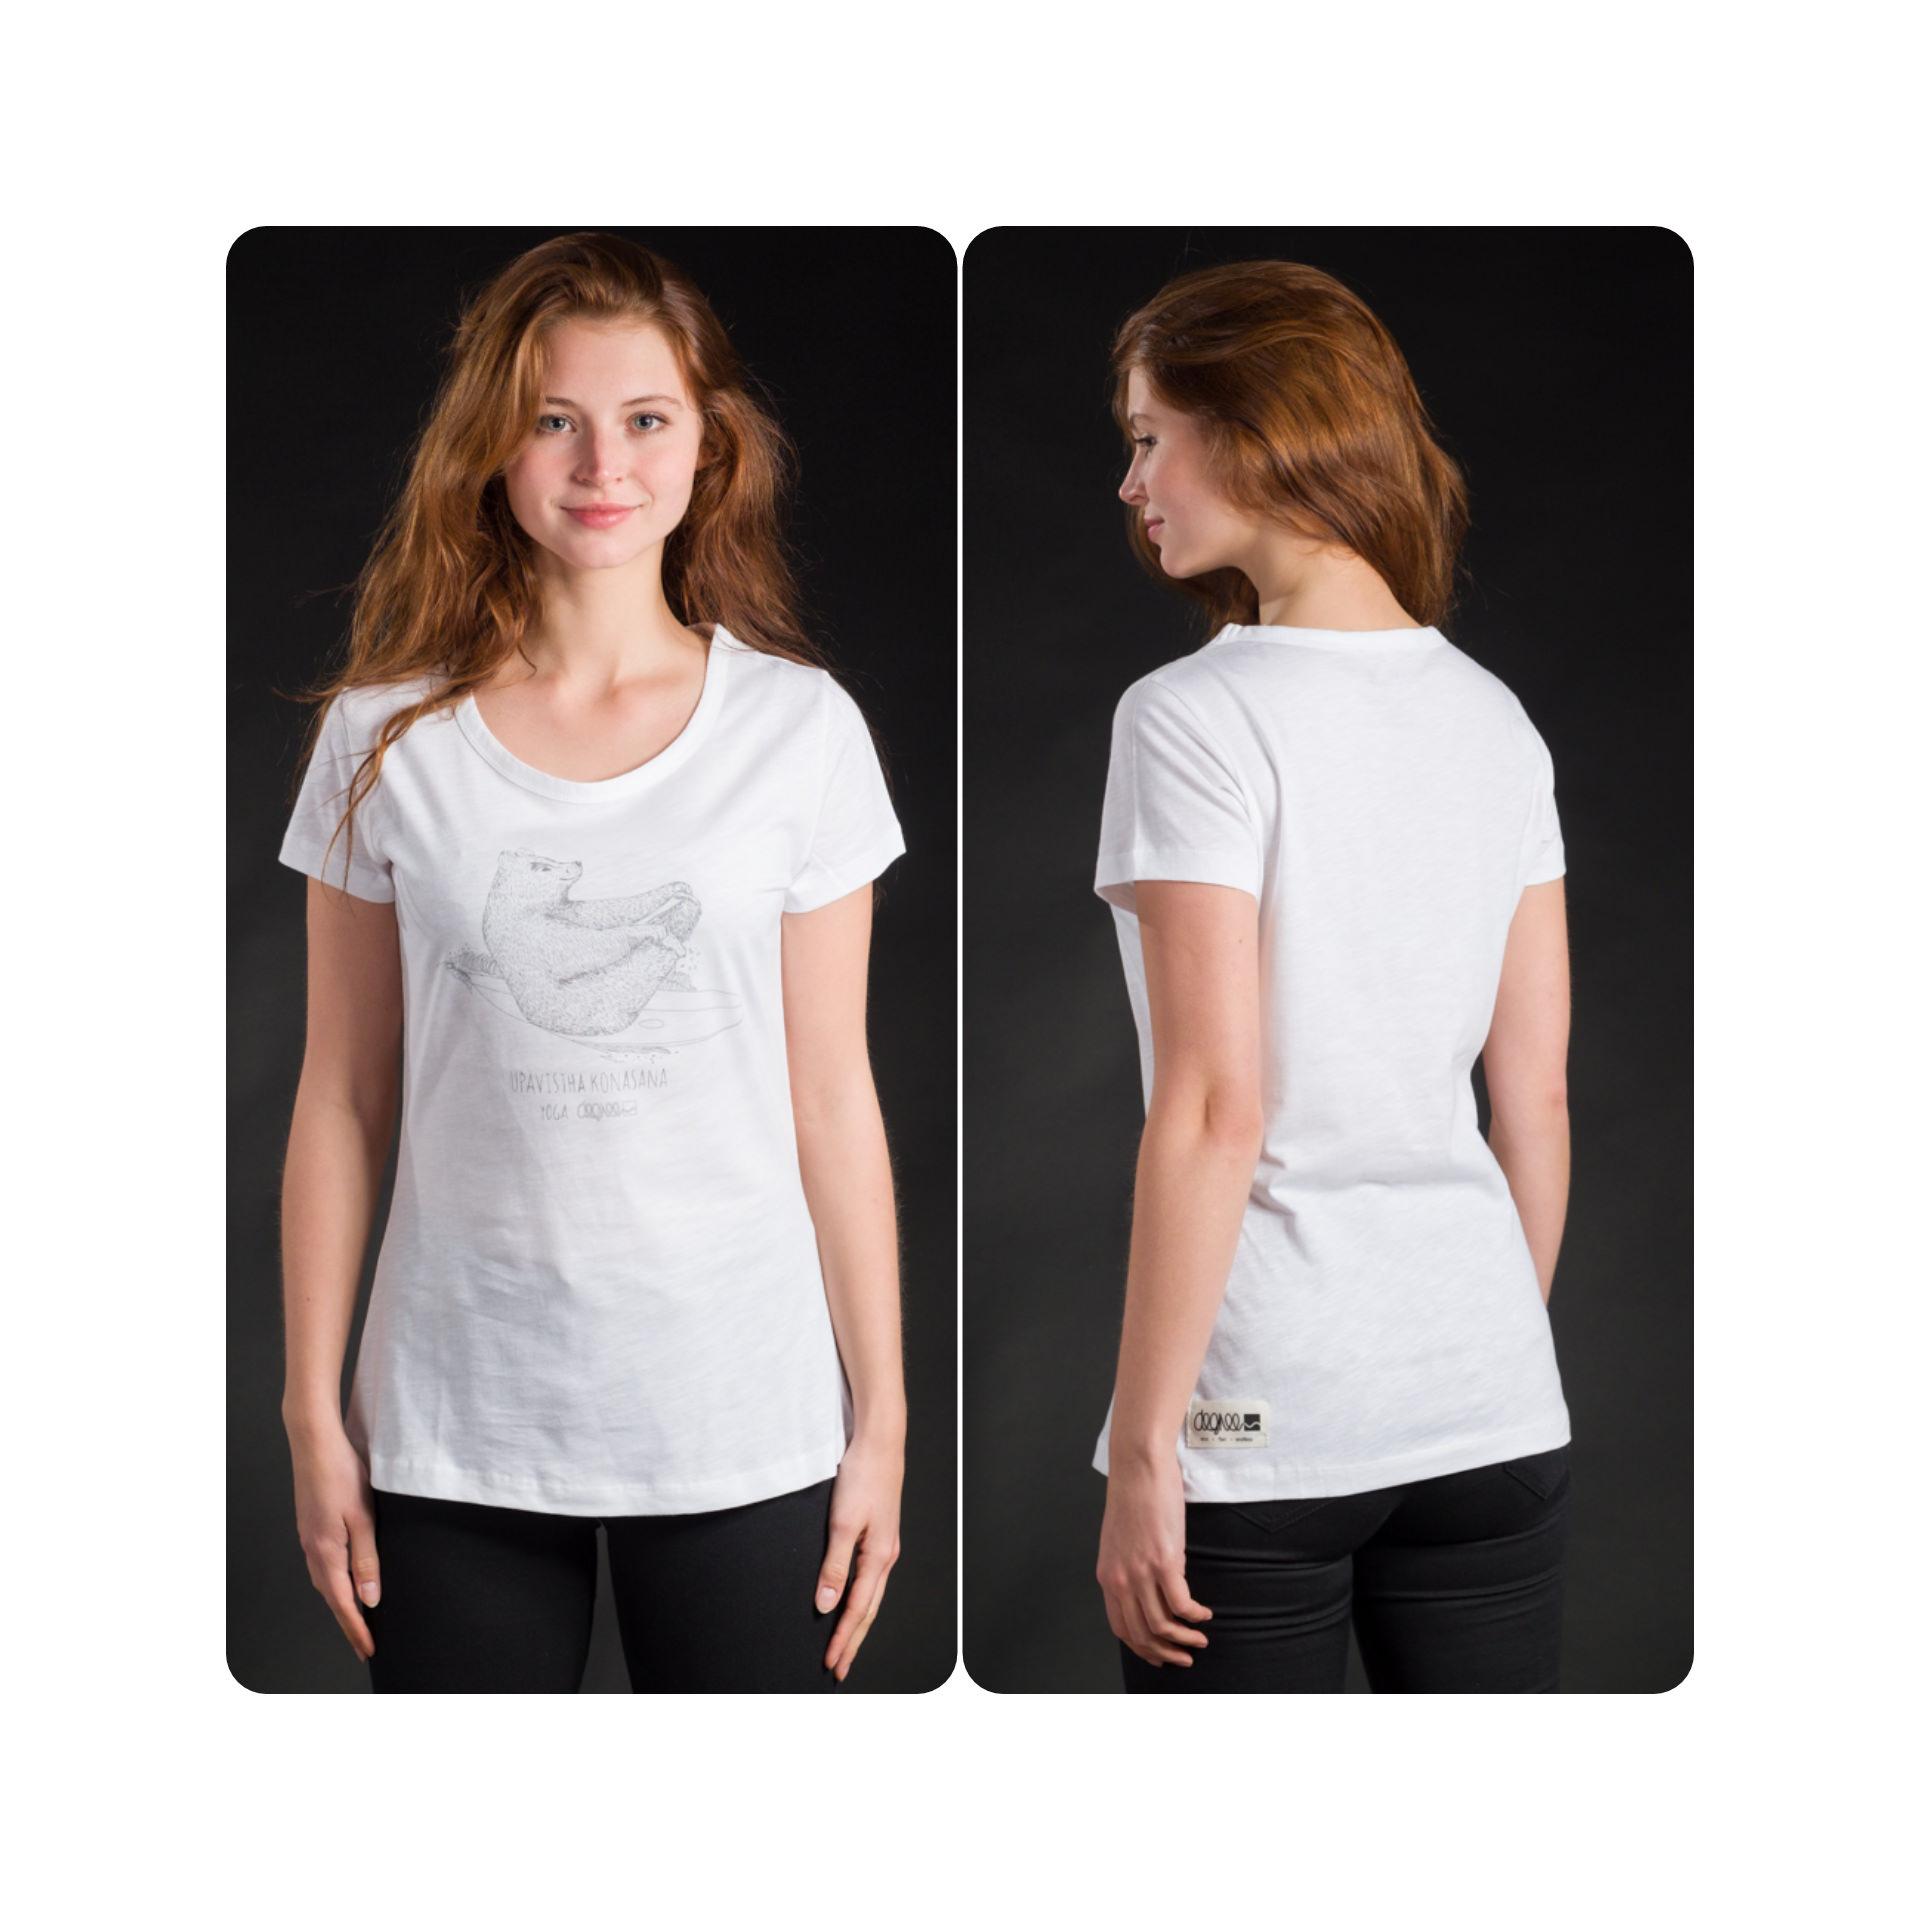 vegane kleidung online shop | fairkleidet